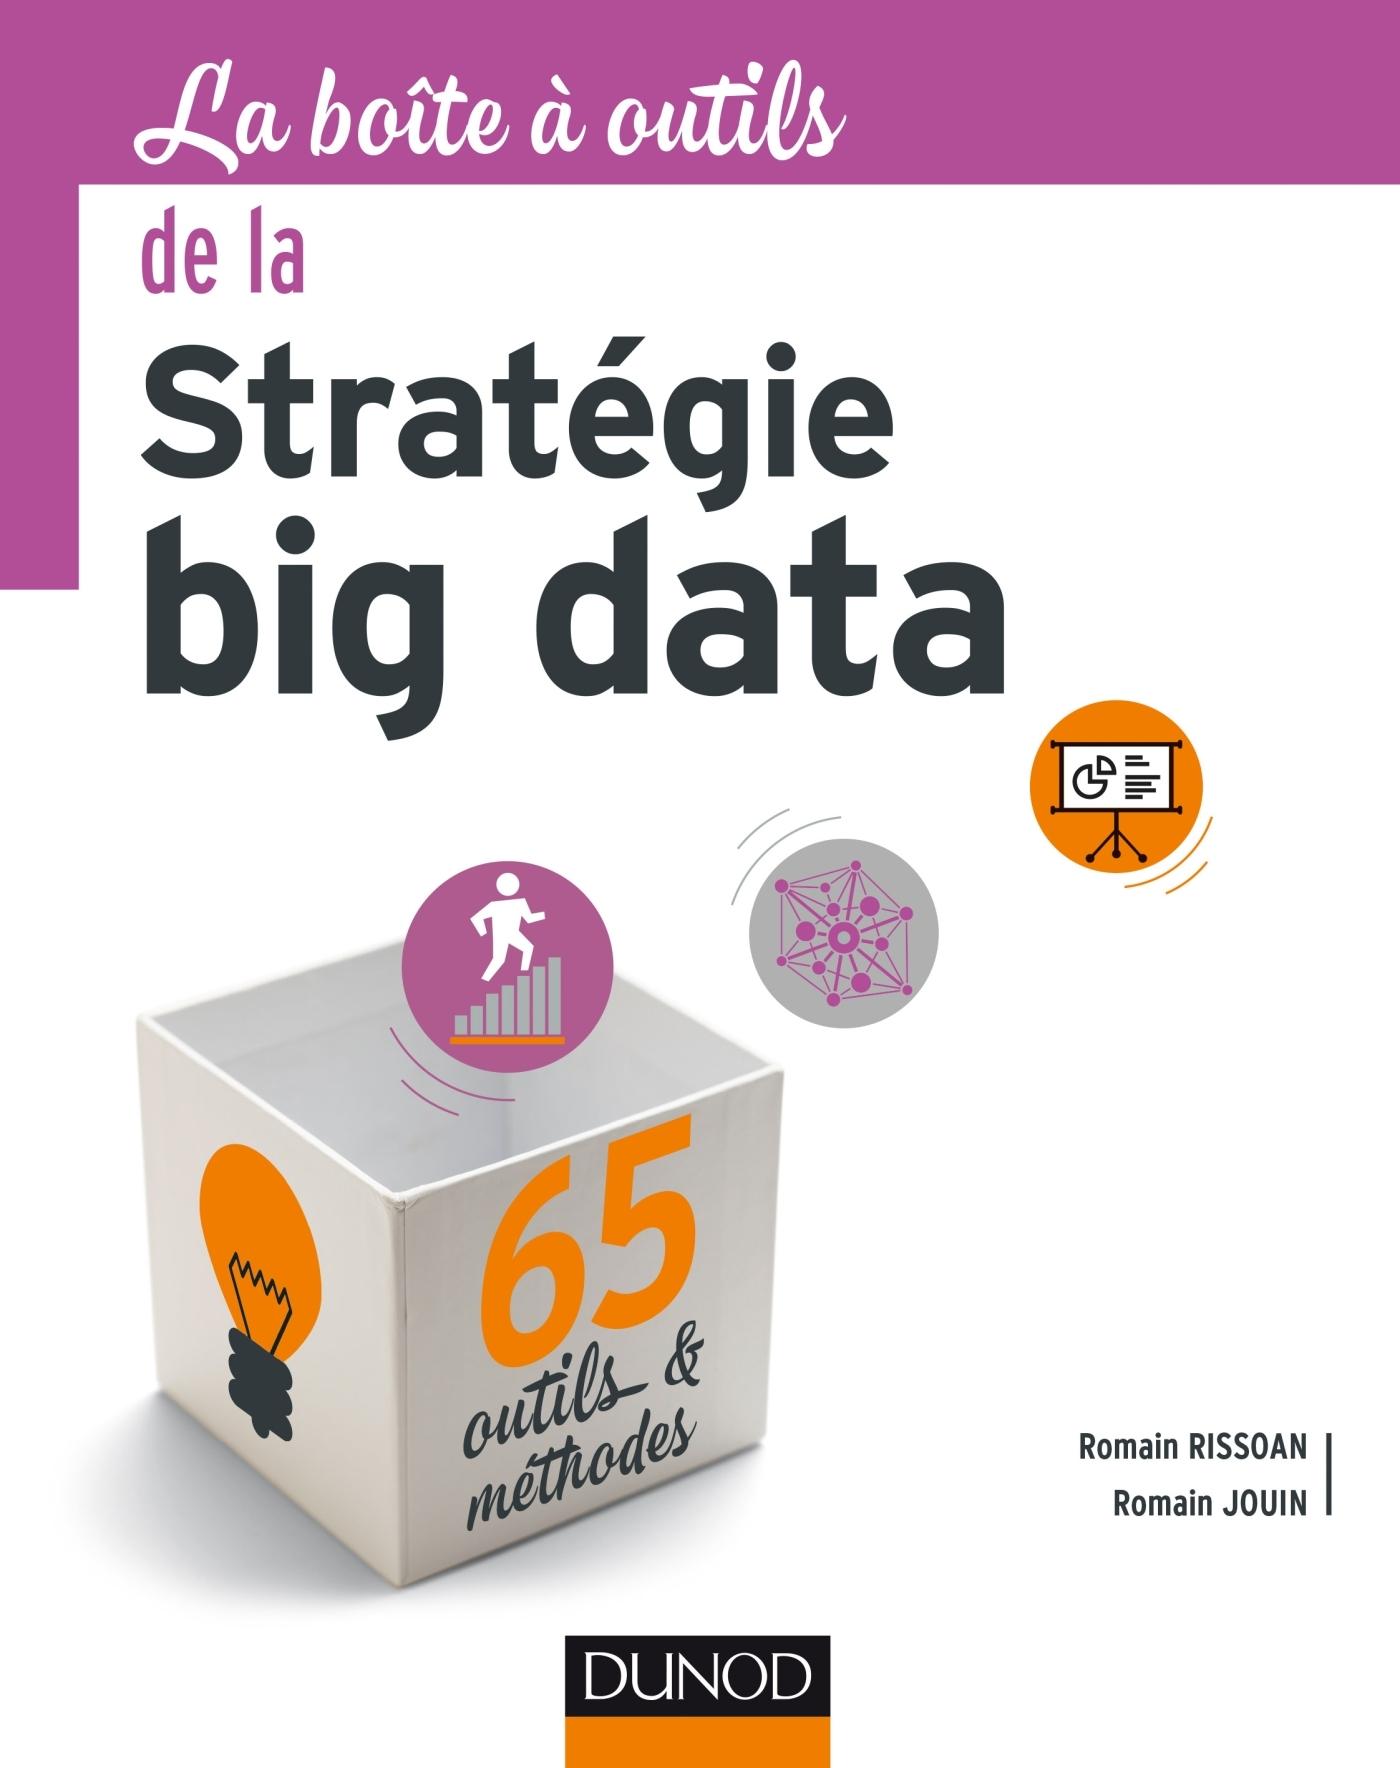 LA BOITE A OUTILS DE LA STRATEGIE BIG DATA